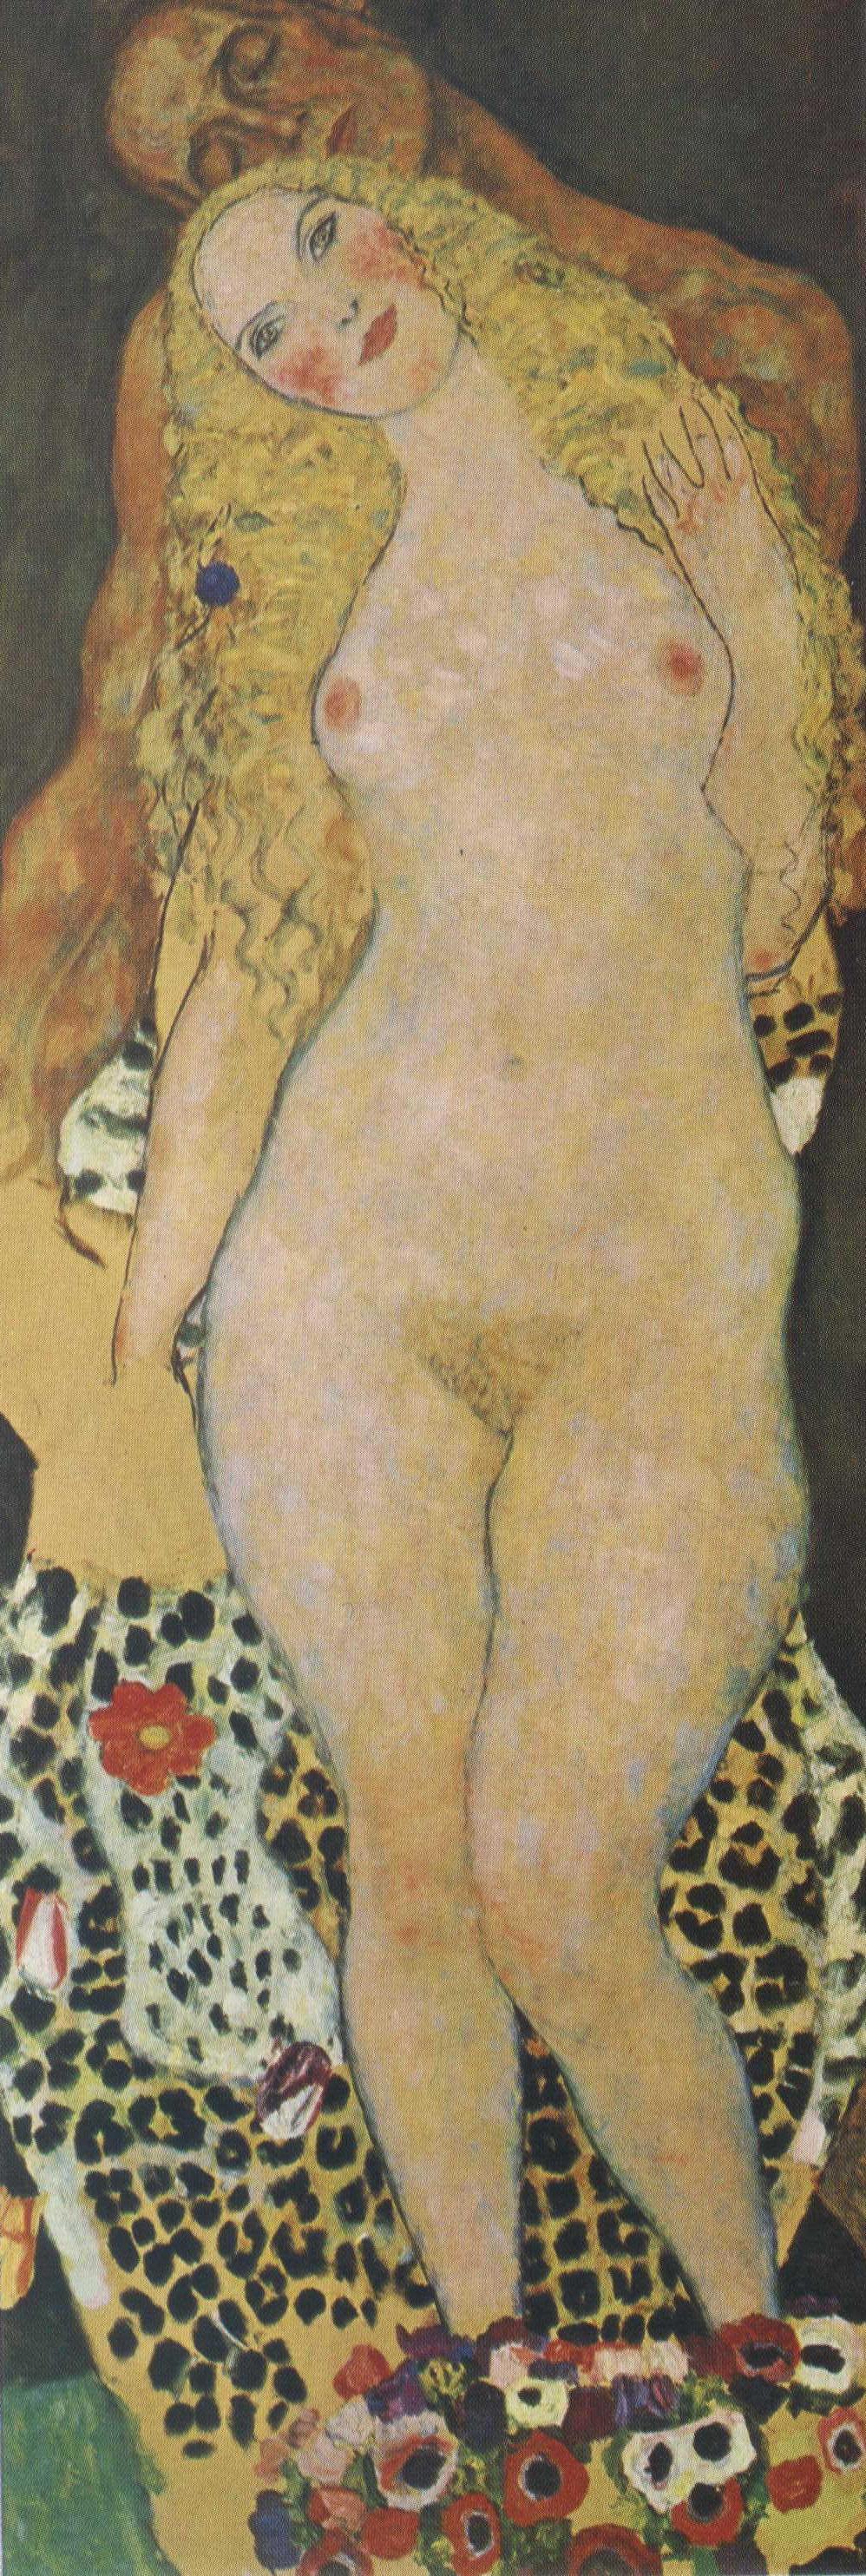 Gustav Klimt. Adam and eve (unfinished)